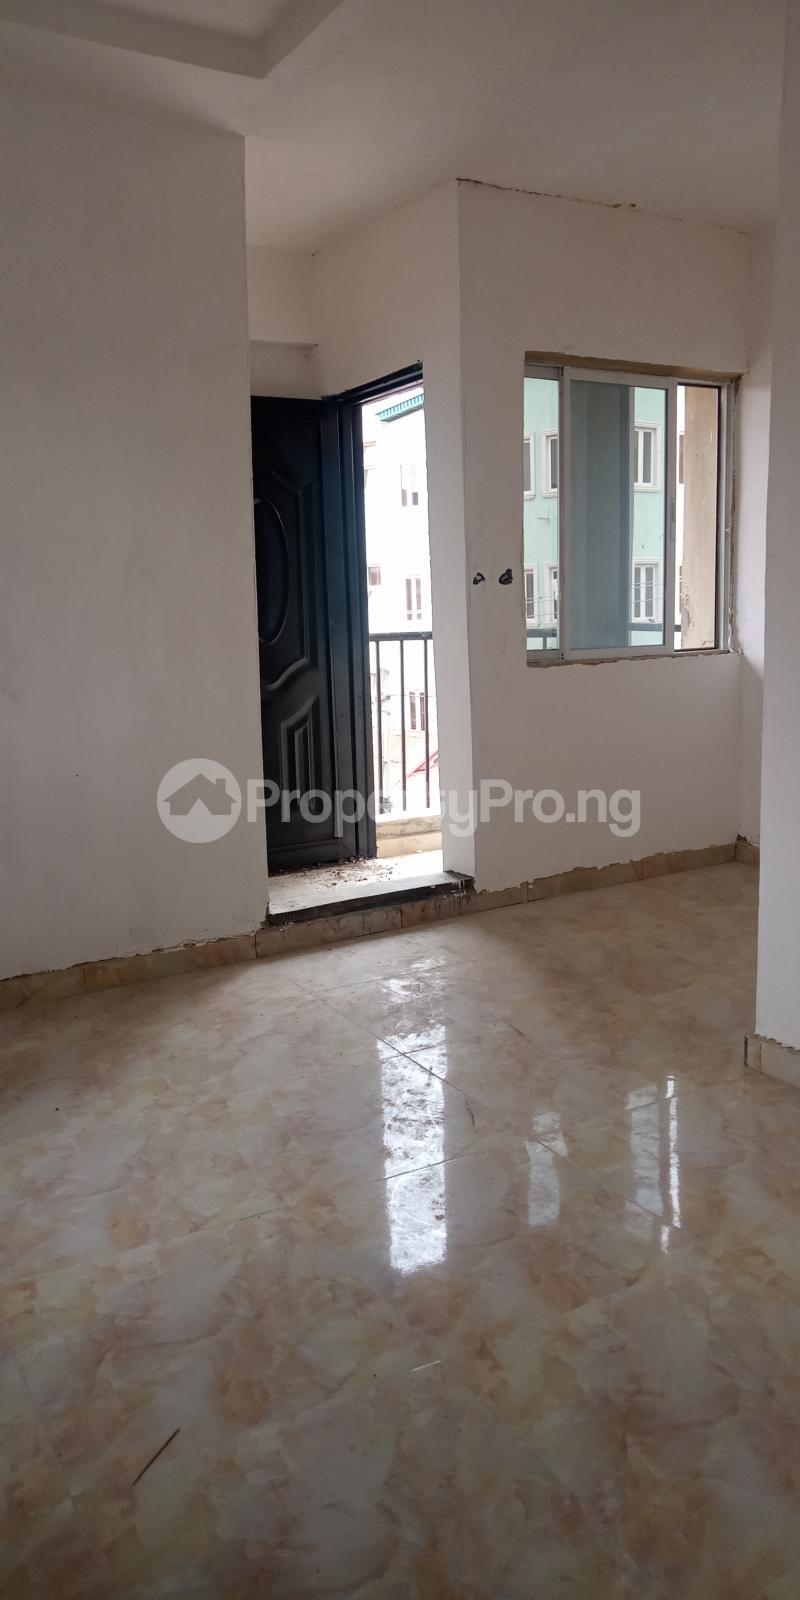 1 bedroom Self Contain for rent Adekunle Ebute Metta Yaba Lagos - 0